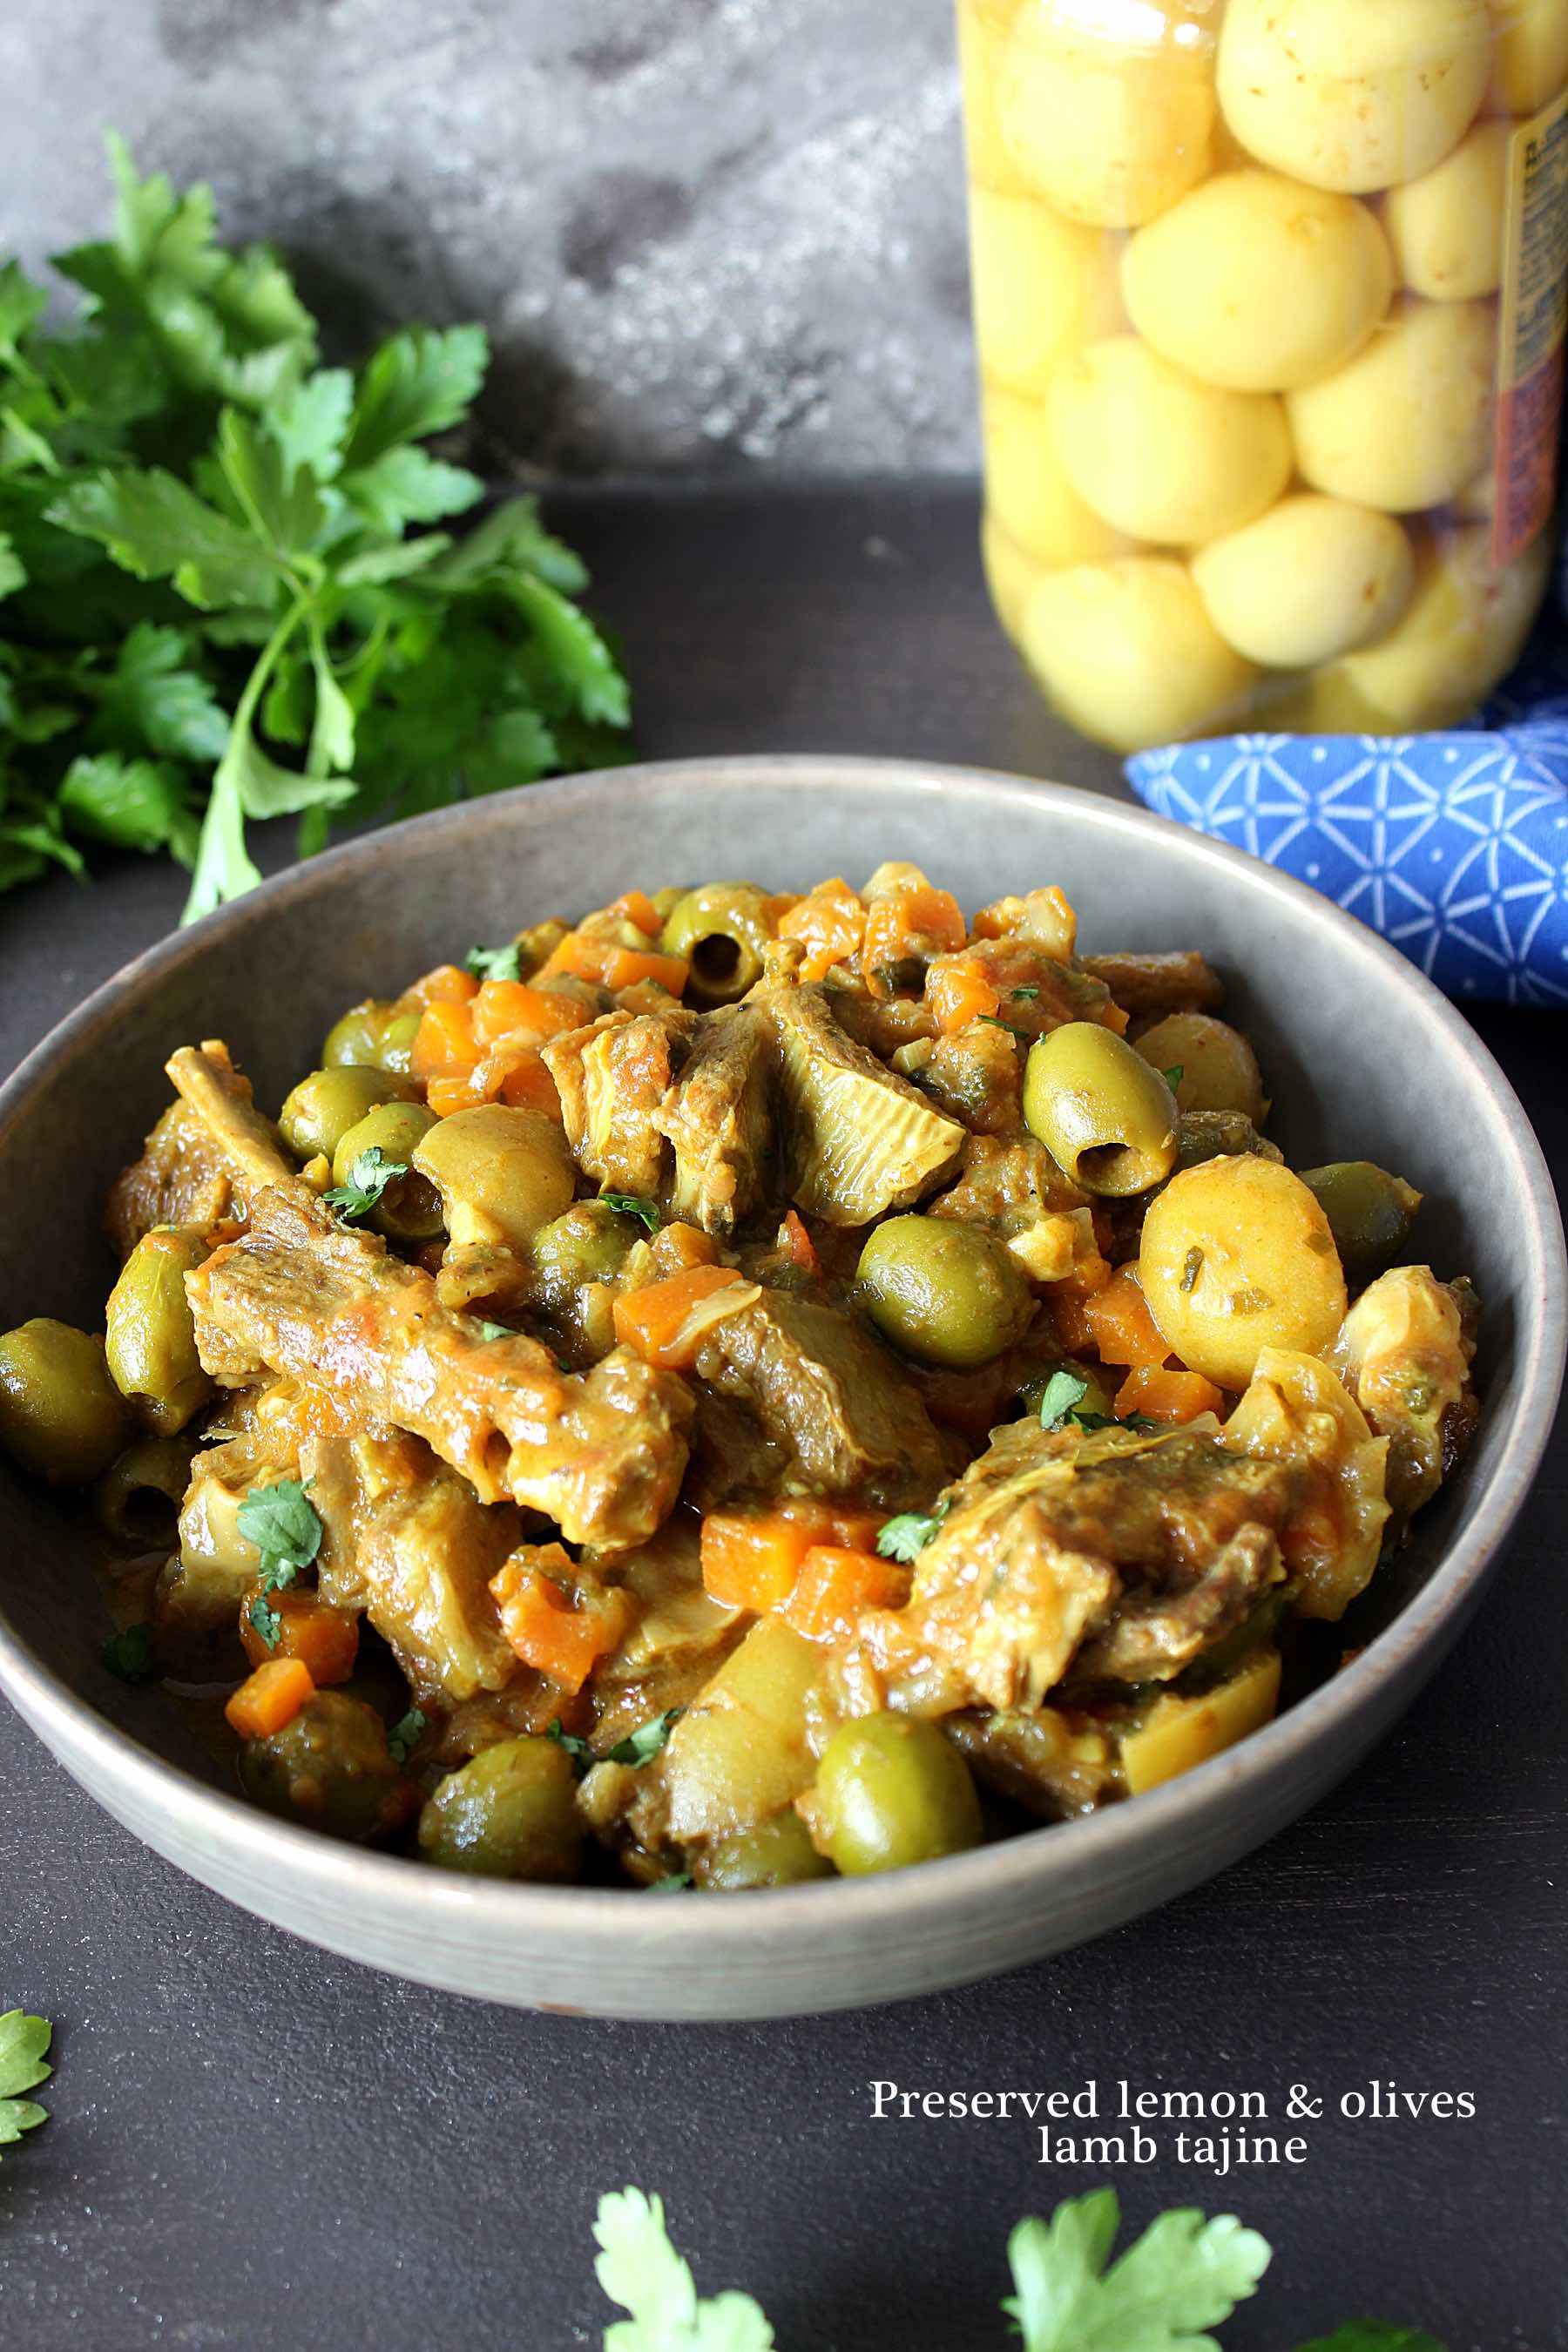 Preserved lemon and olives lamb tajine